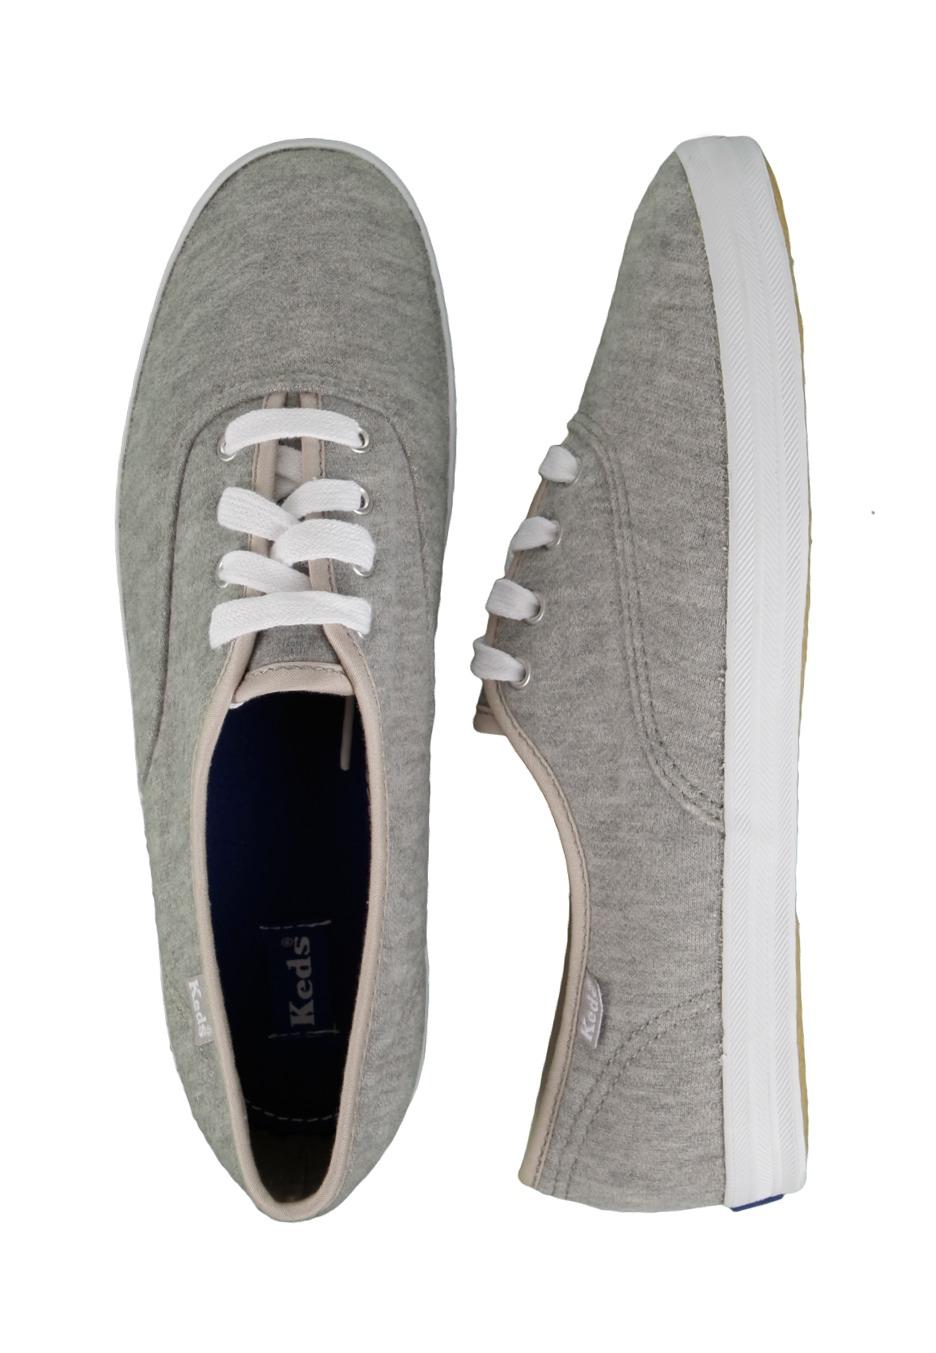 ad9895ec70e Keds - Champion OX Heather Grey - Girl Shoes - Impericon.com AU